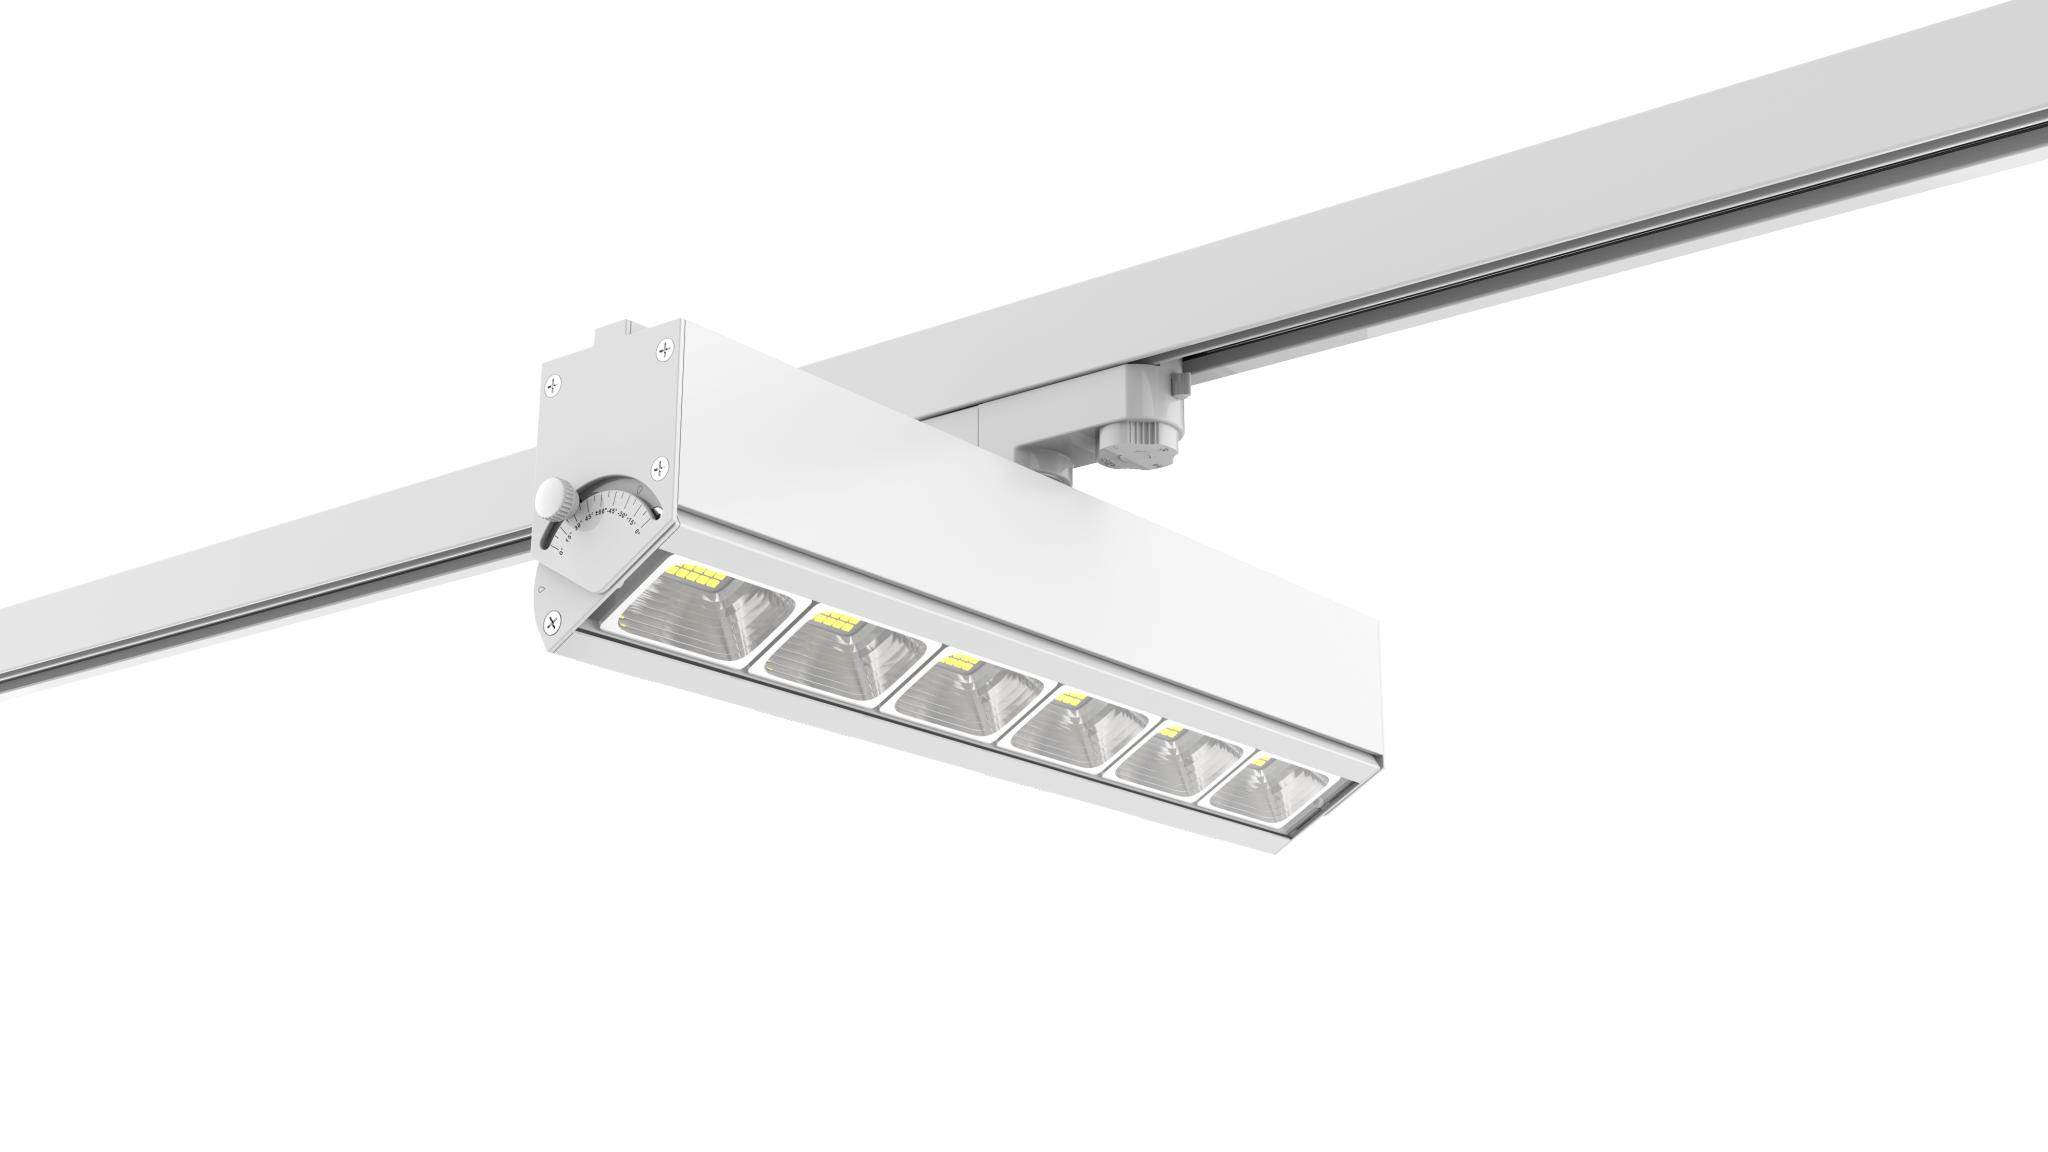 Bricks Rotatable 350 Series Linear LED Track Light Motion Sensor 5years warranty 3